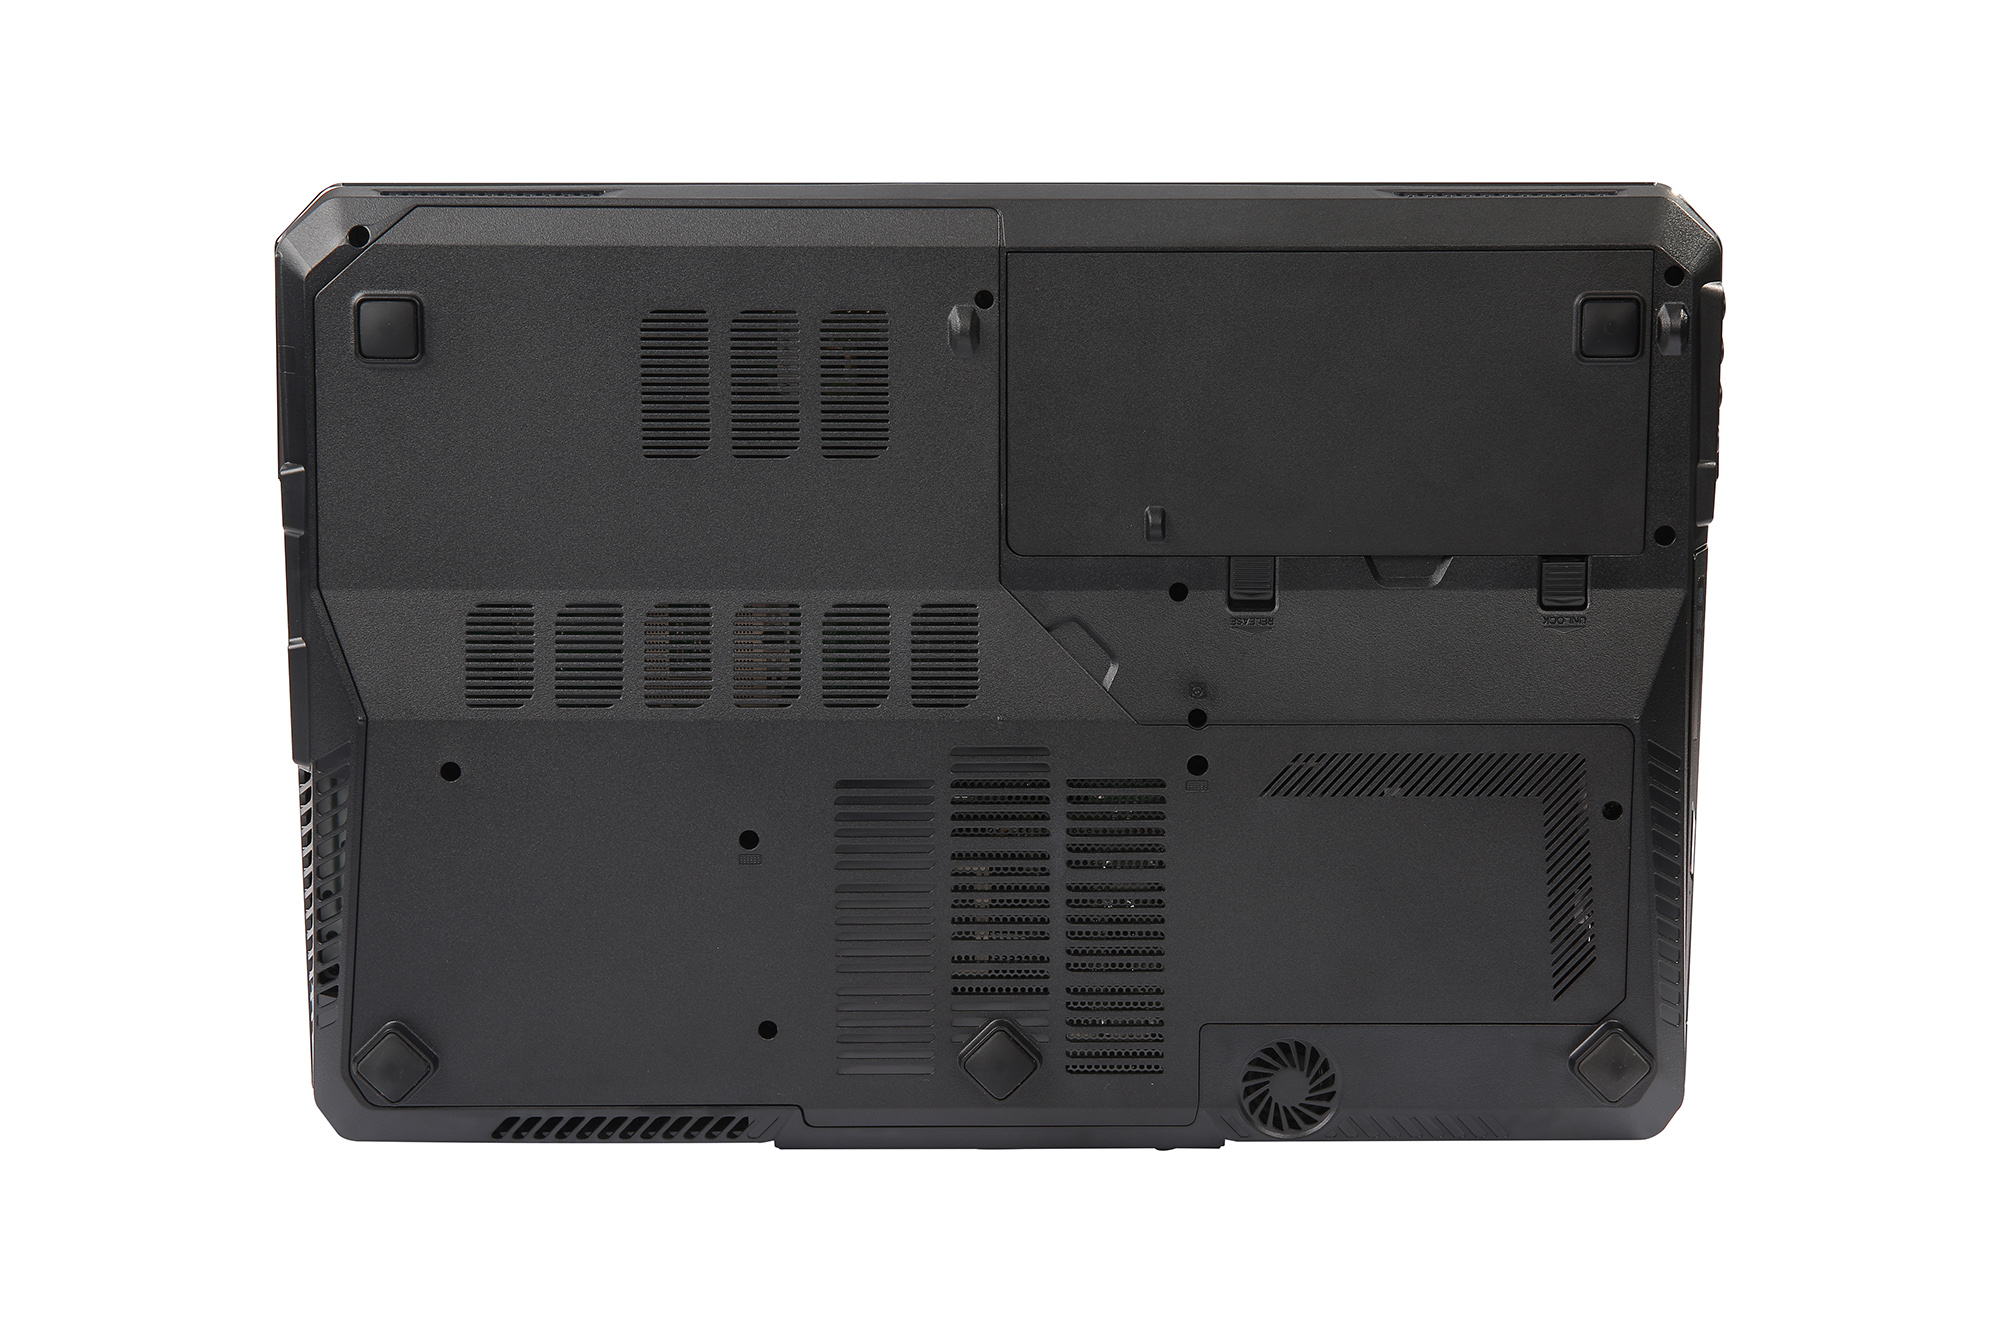 MONSTER® Q48MS-16F48 15.6